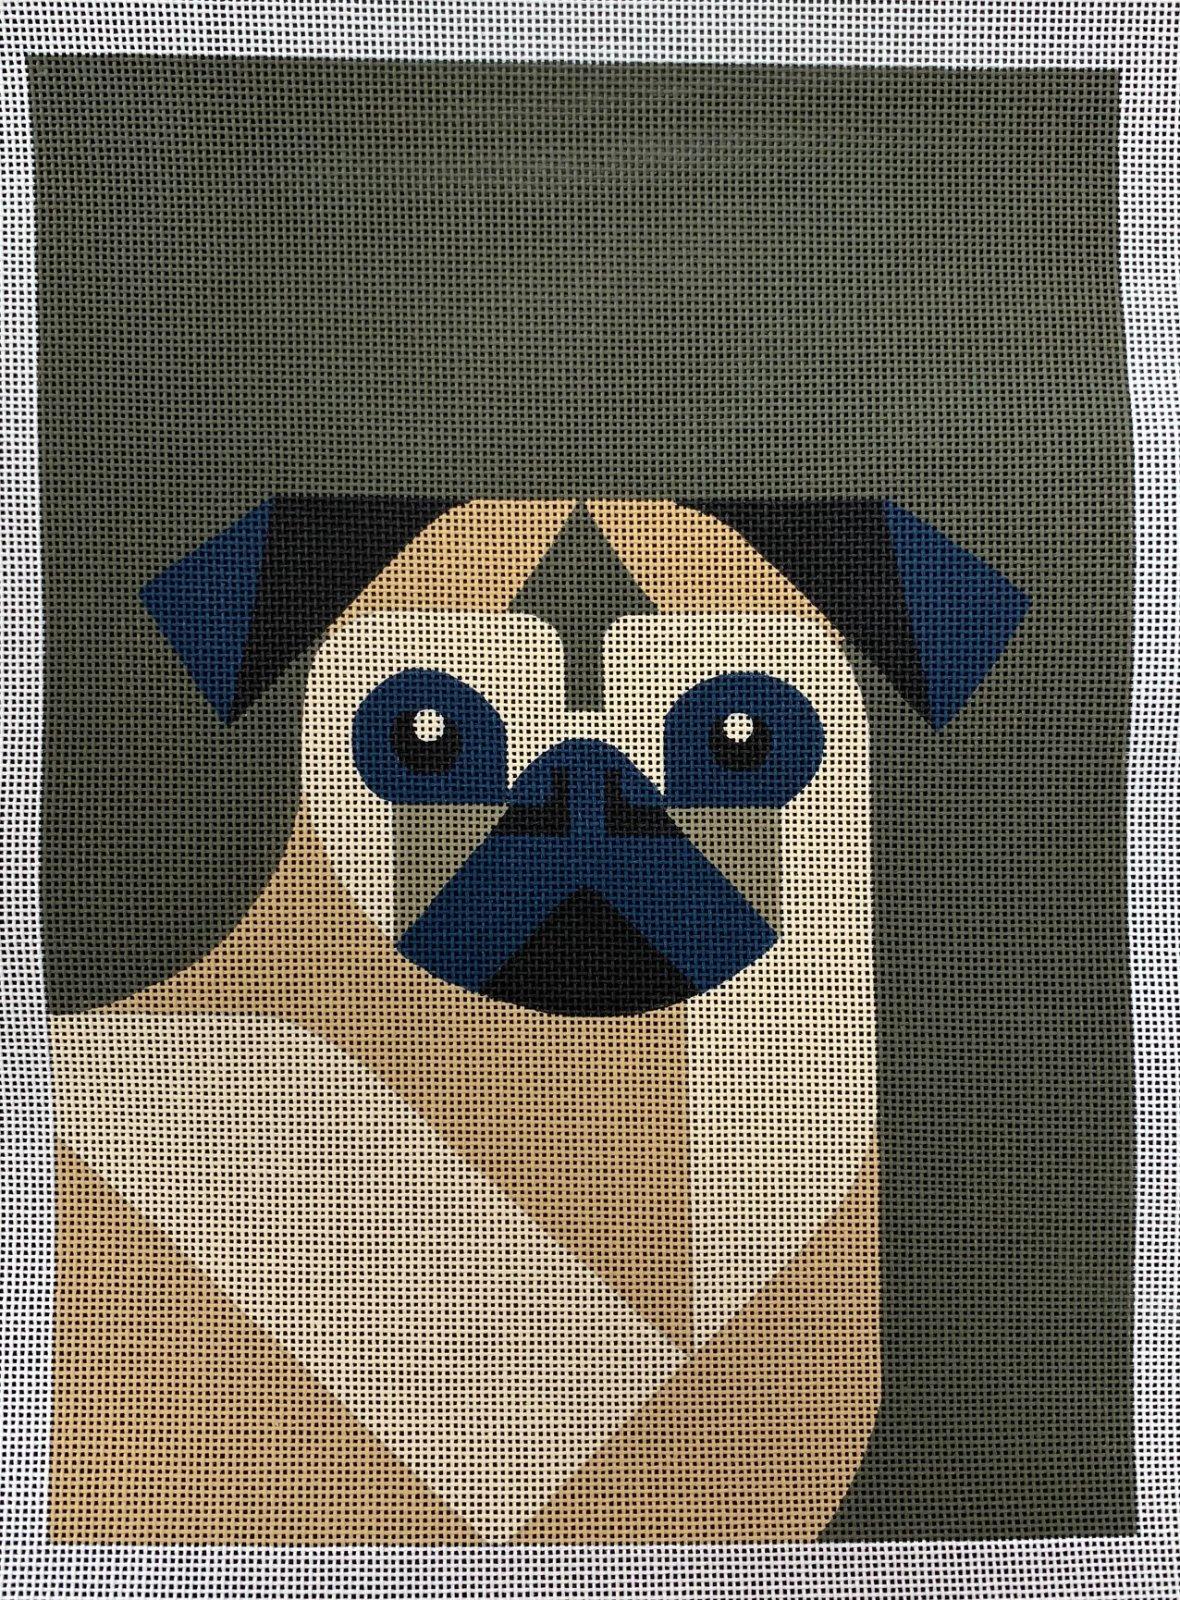 Blue Earred Pug Dog